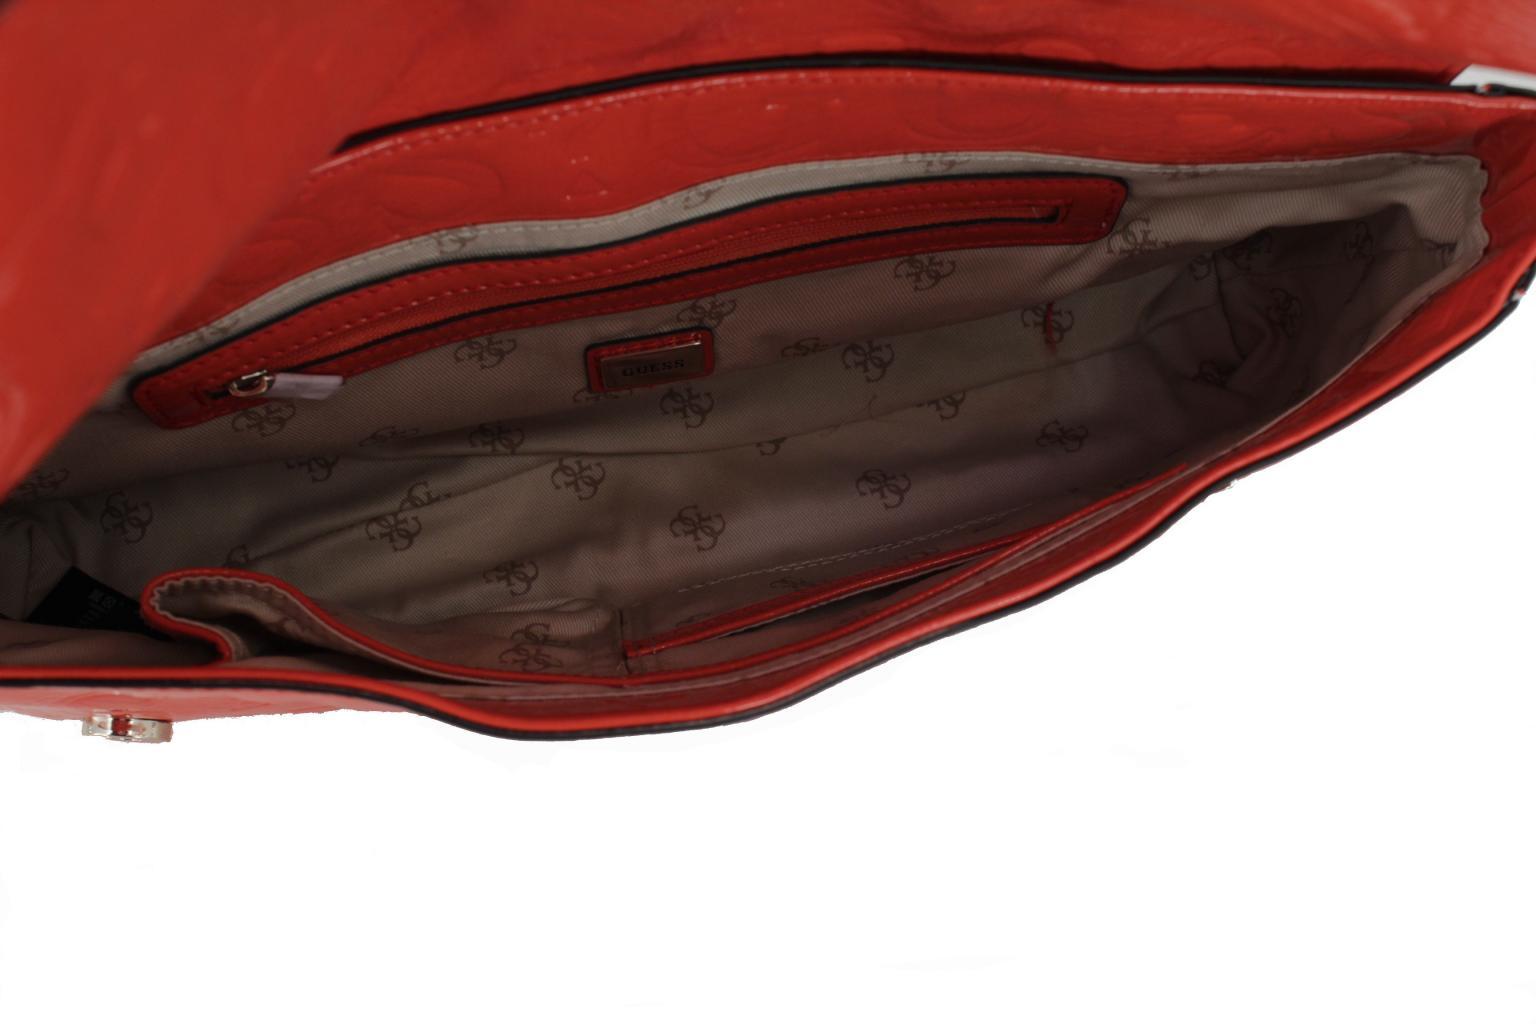 Handtasche Guess Printdruck Lack poppy rot Schultergurt